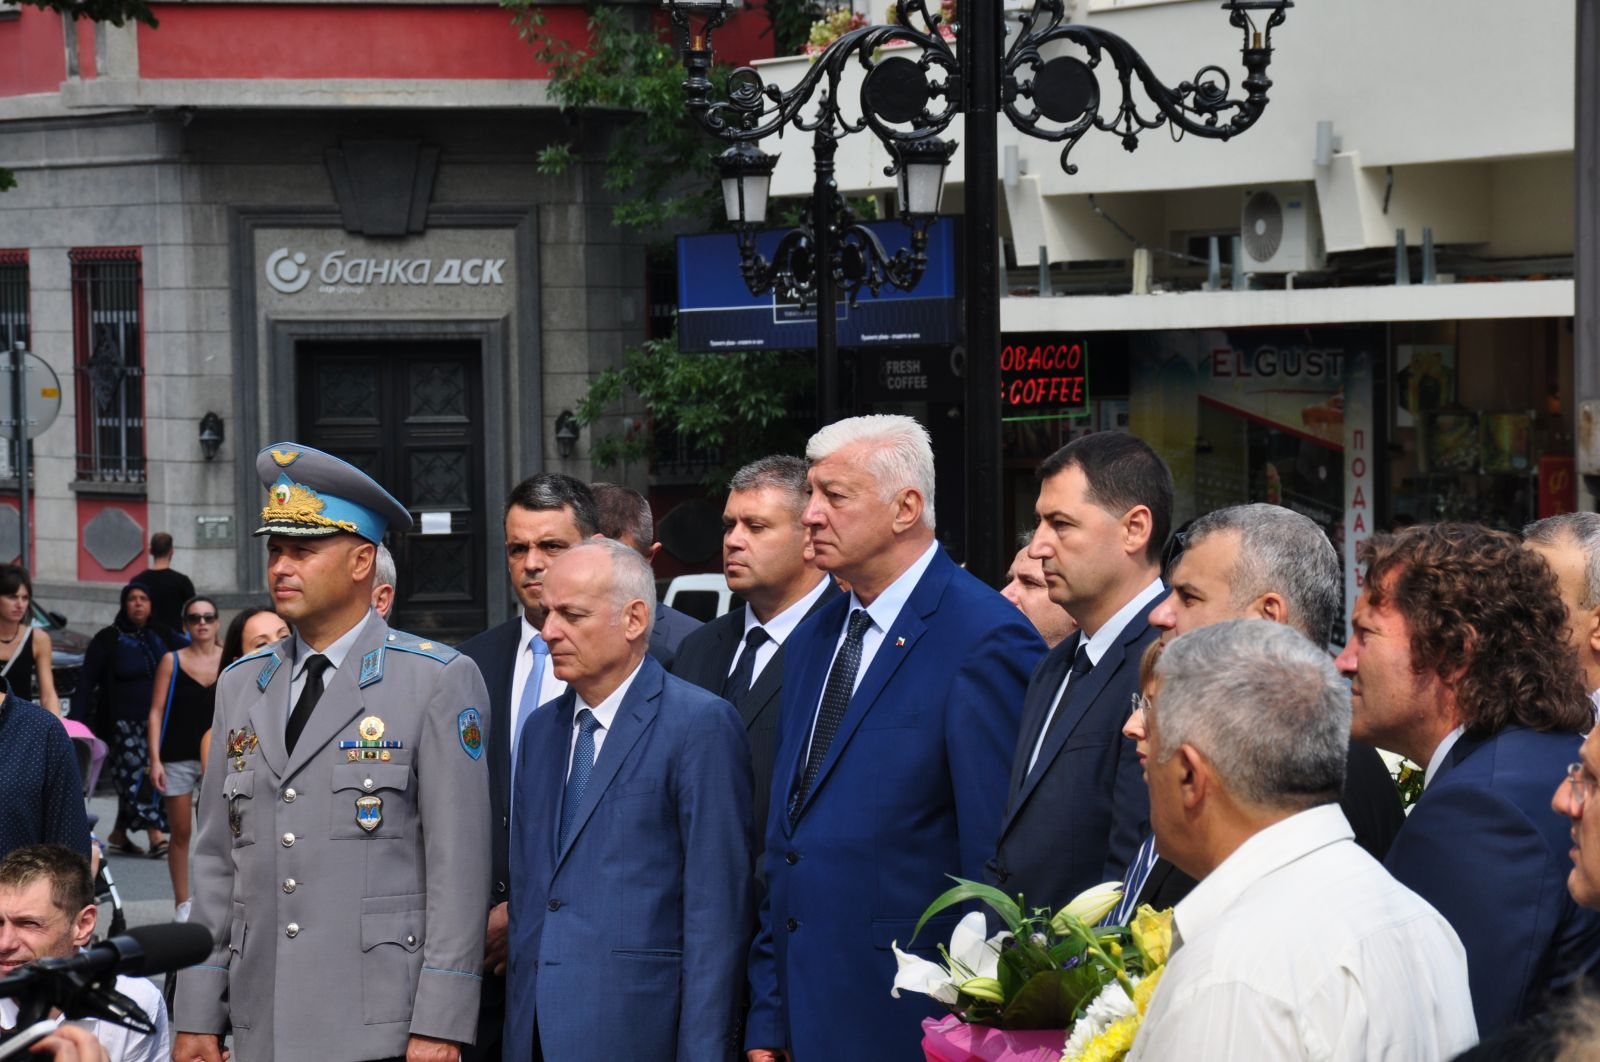 Пловдив празнува (СНИМКИ)